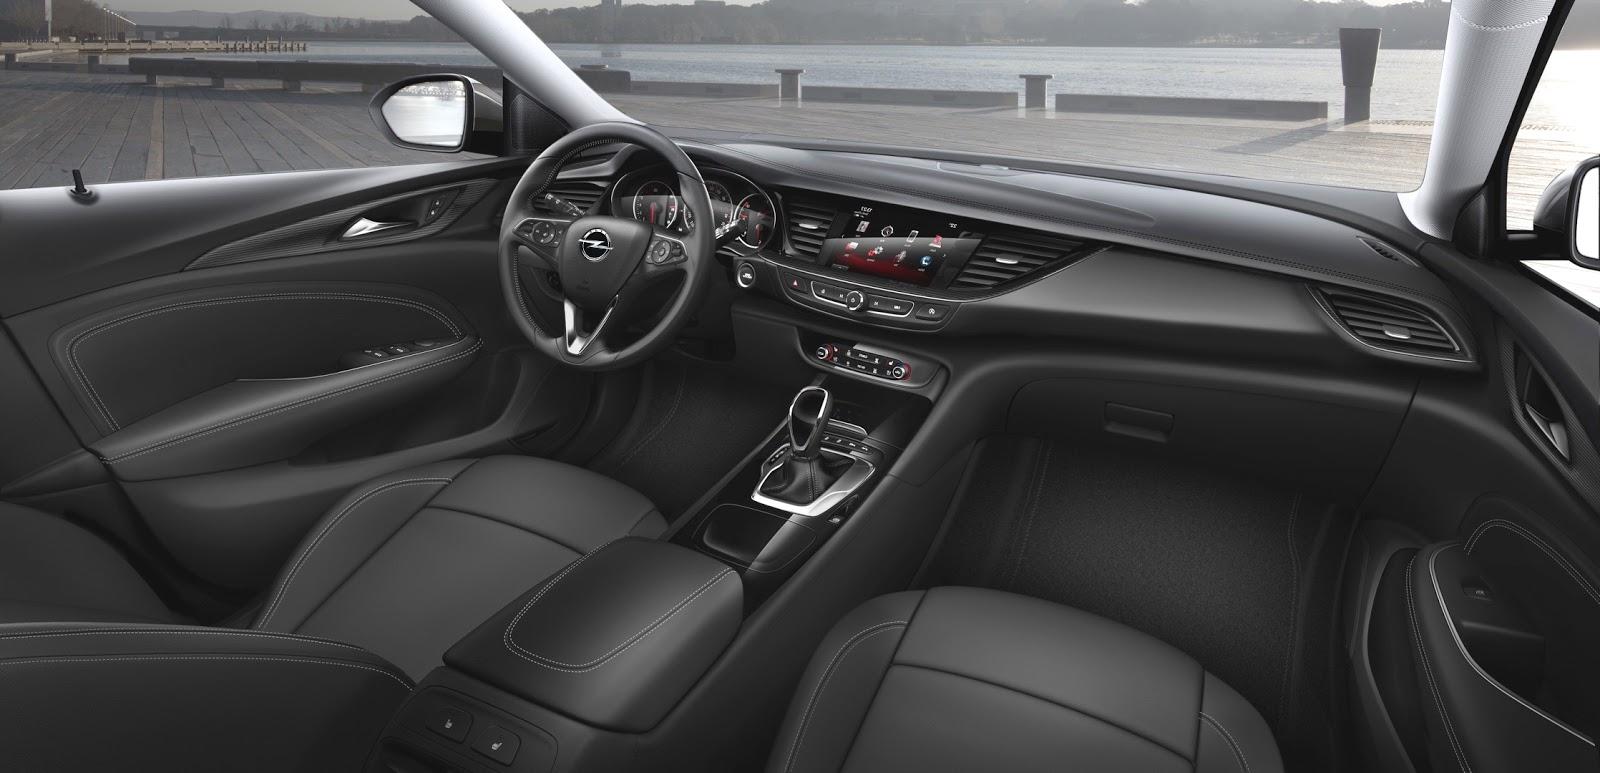 Car design and my life...: Opel Insignia Grand Sport Interior